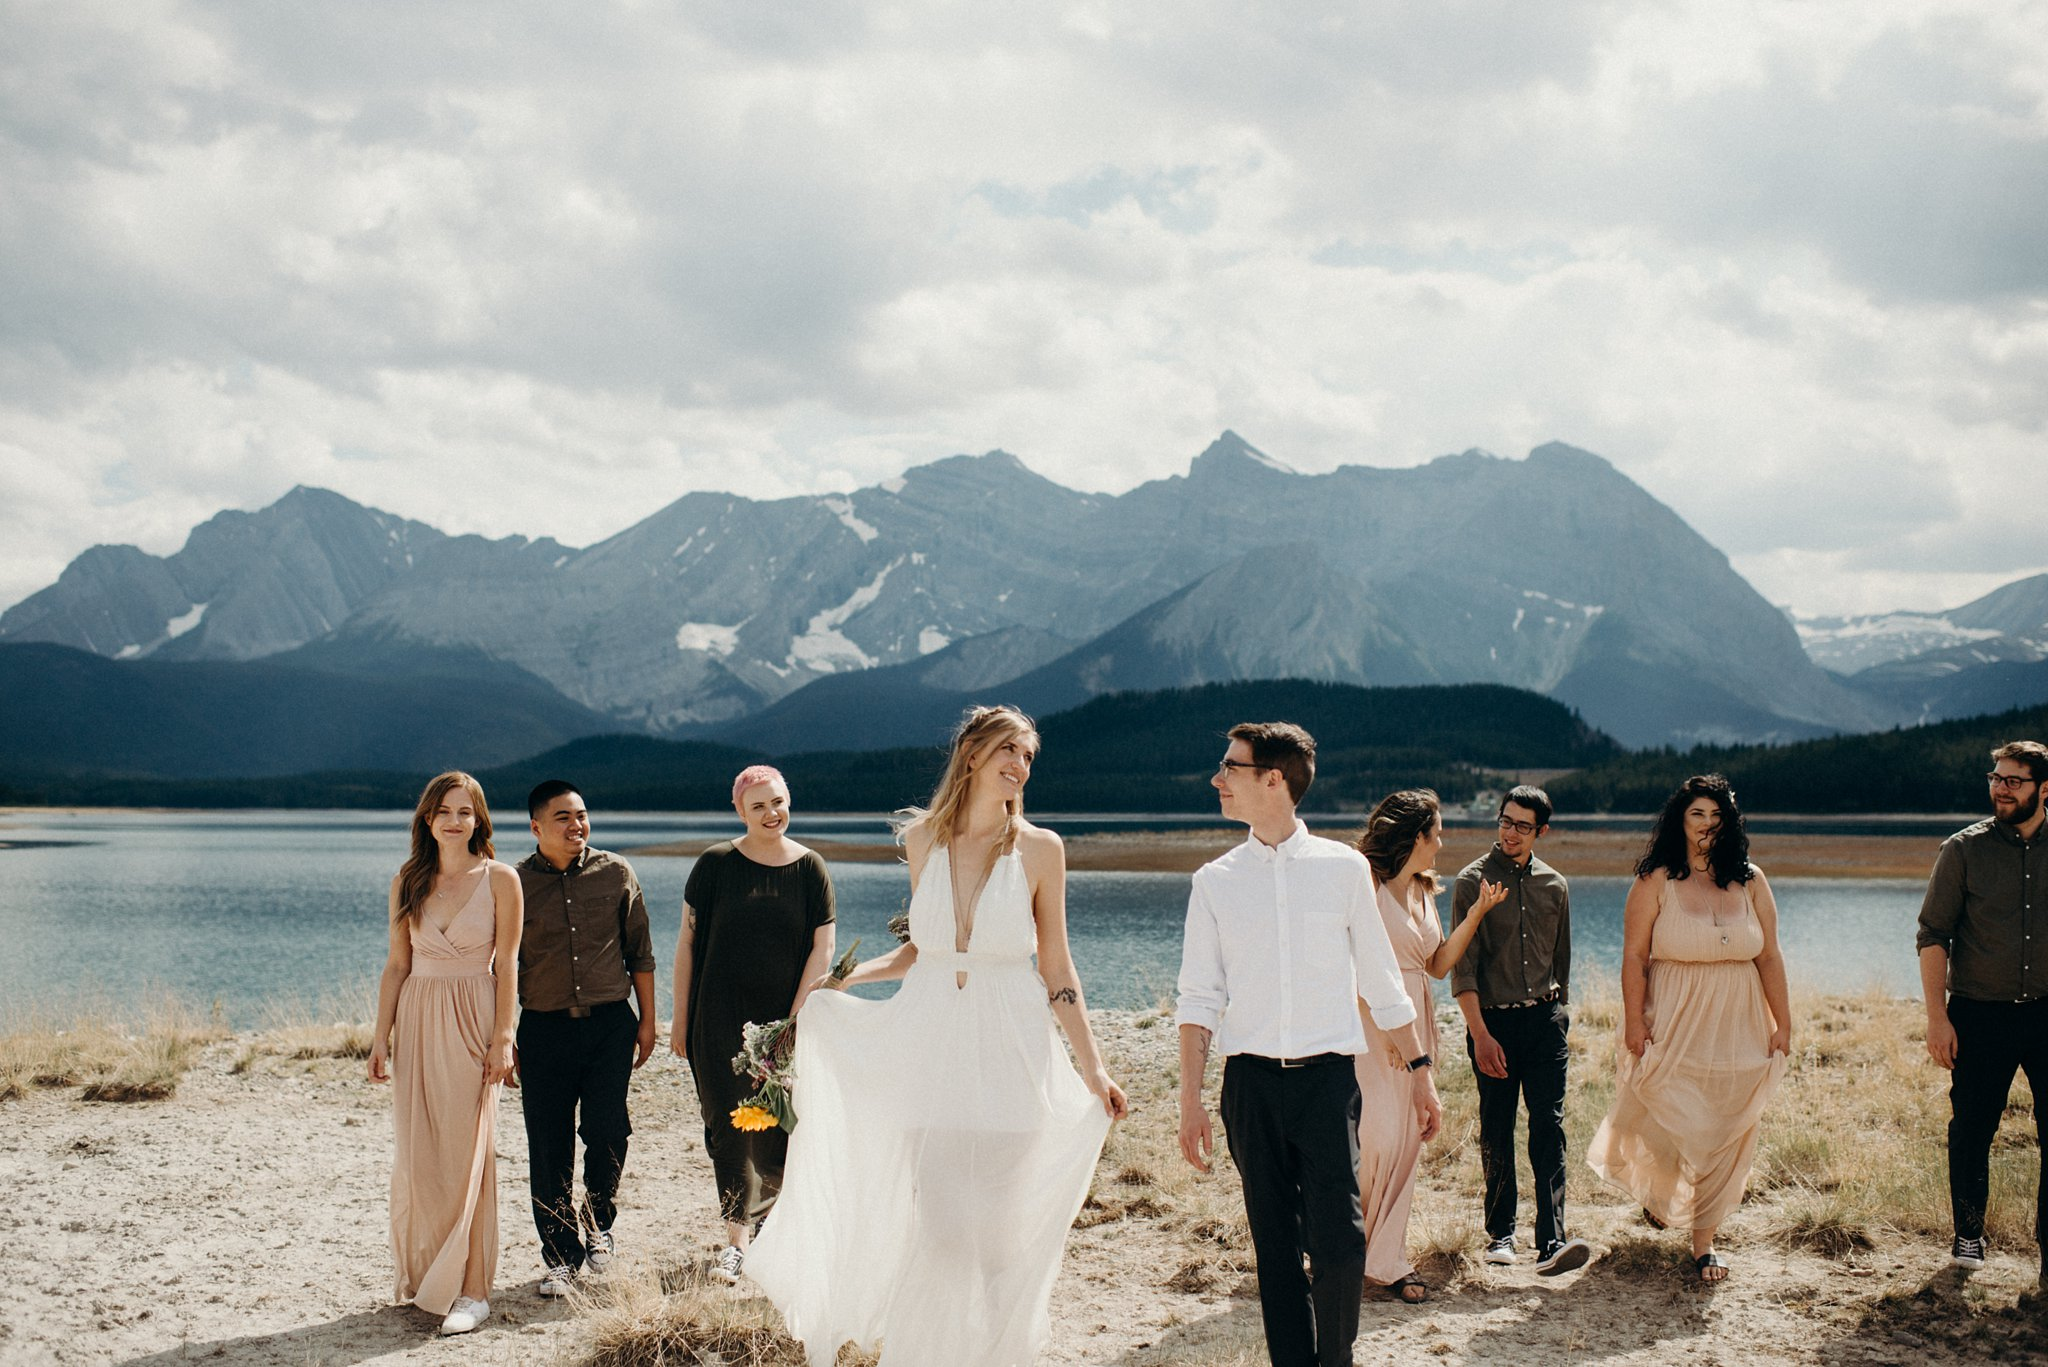 kaihla_tonai_intimate_wedding_elopement_photographer_6396.jpg